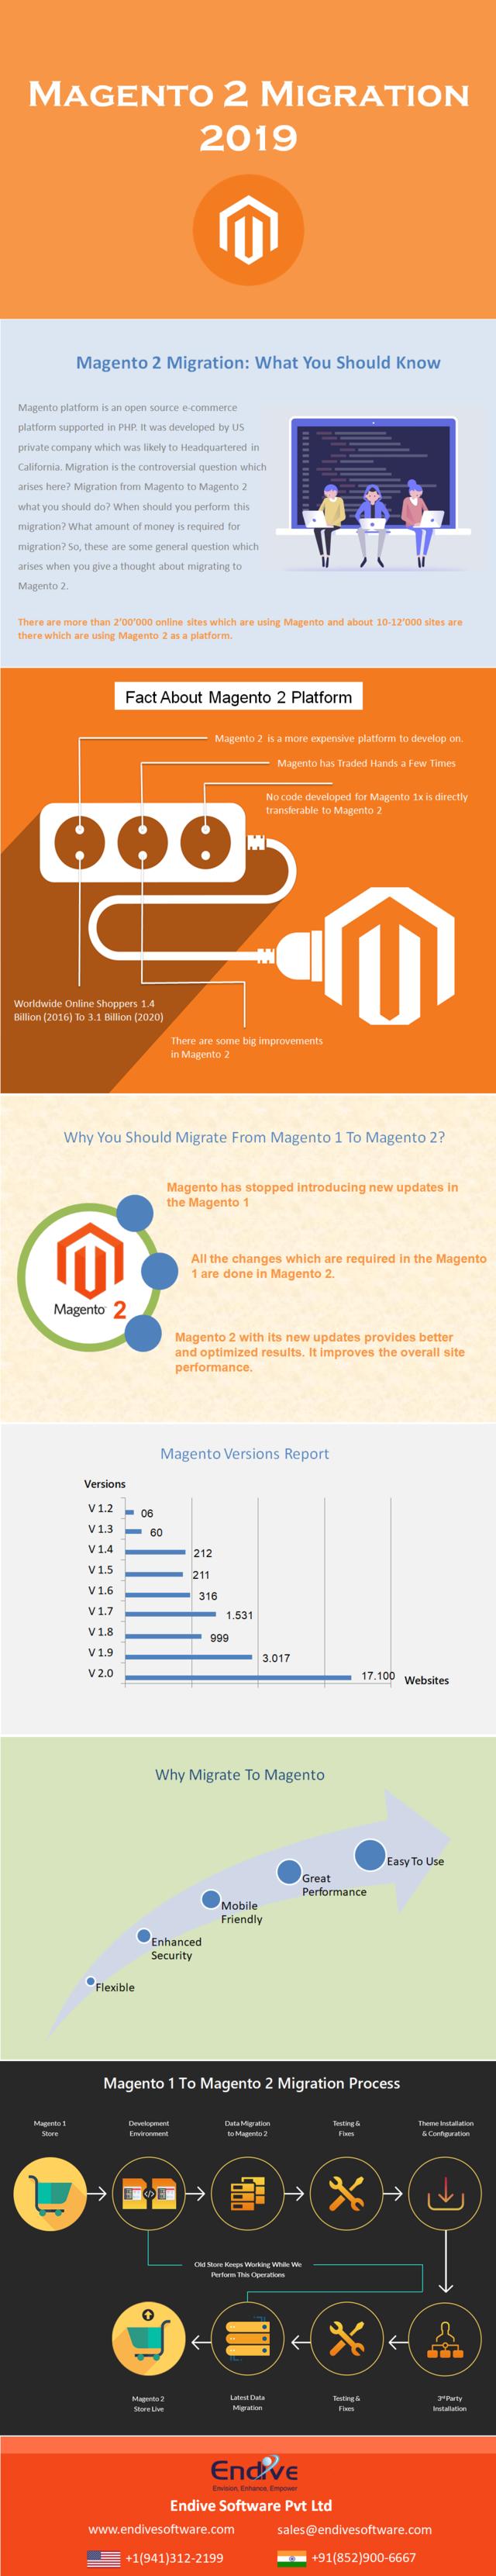 Magento 2 migration in 2019